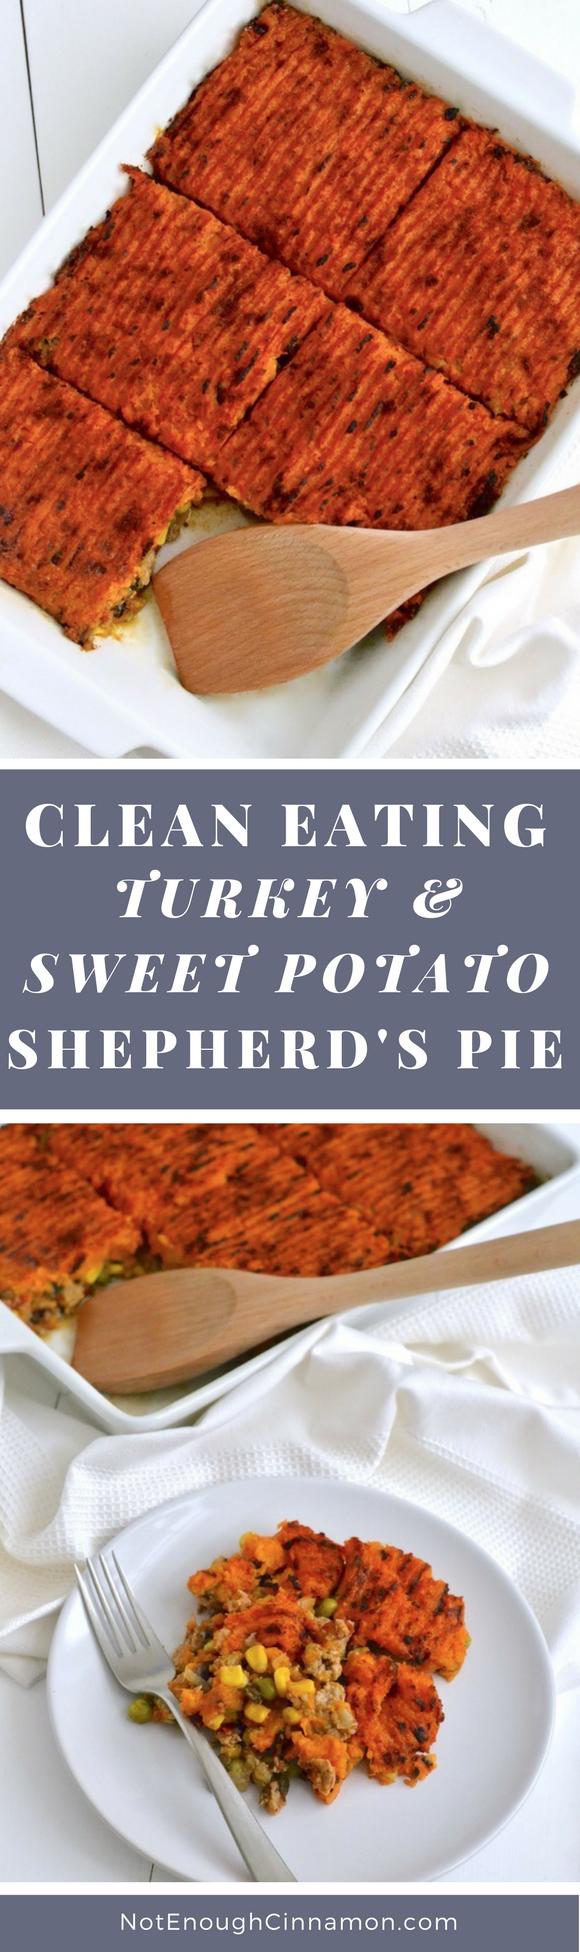 Clean Eating Turkey and Sweet Potato Shepherd's Pie #shepardspie